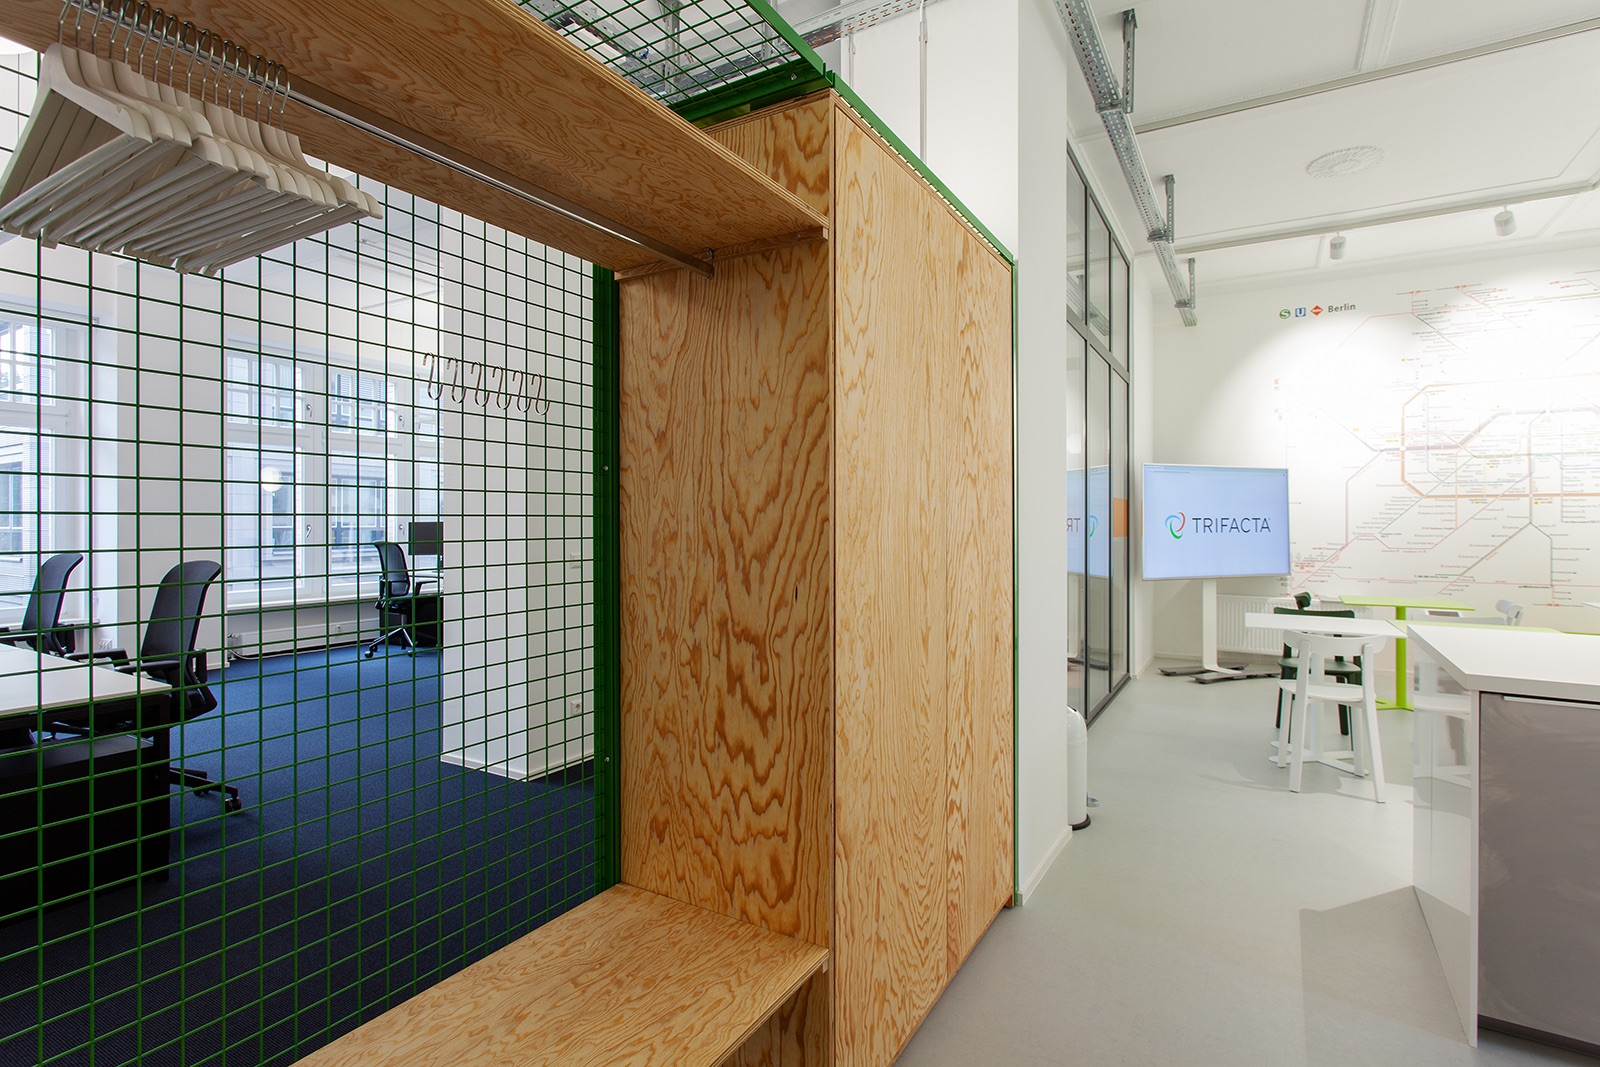 trifacta-berlin-office-11